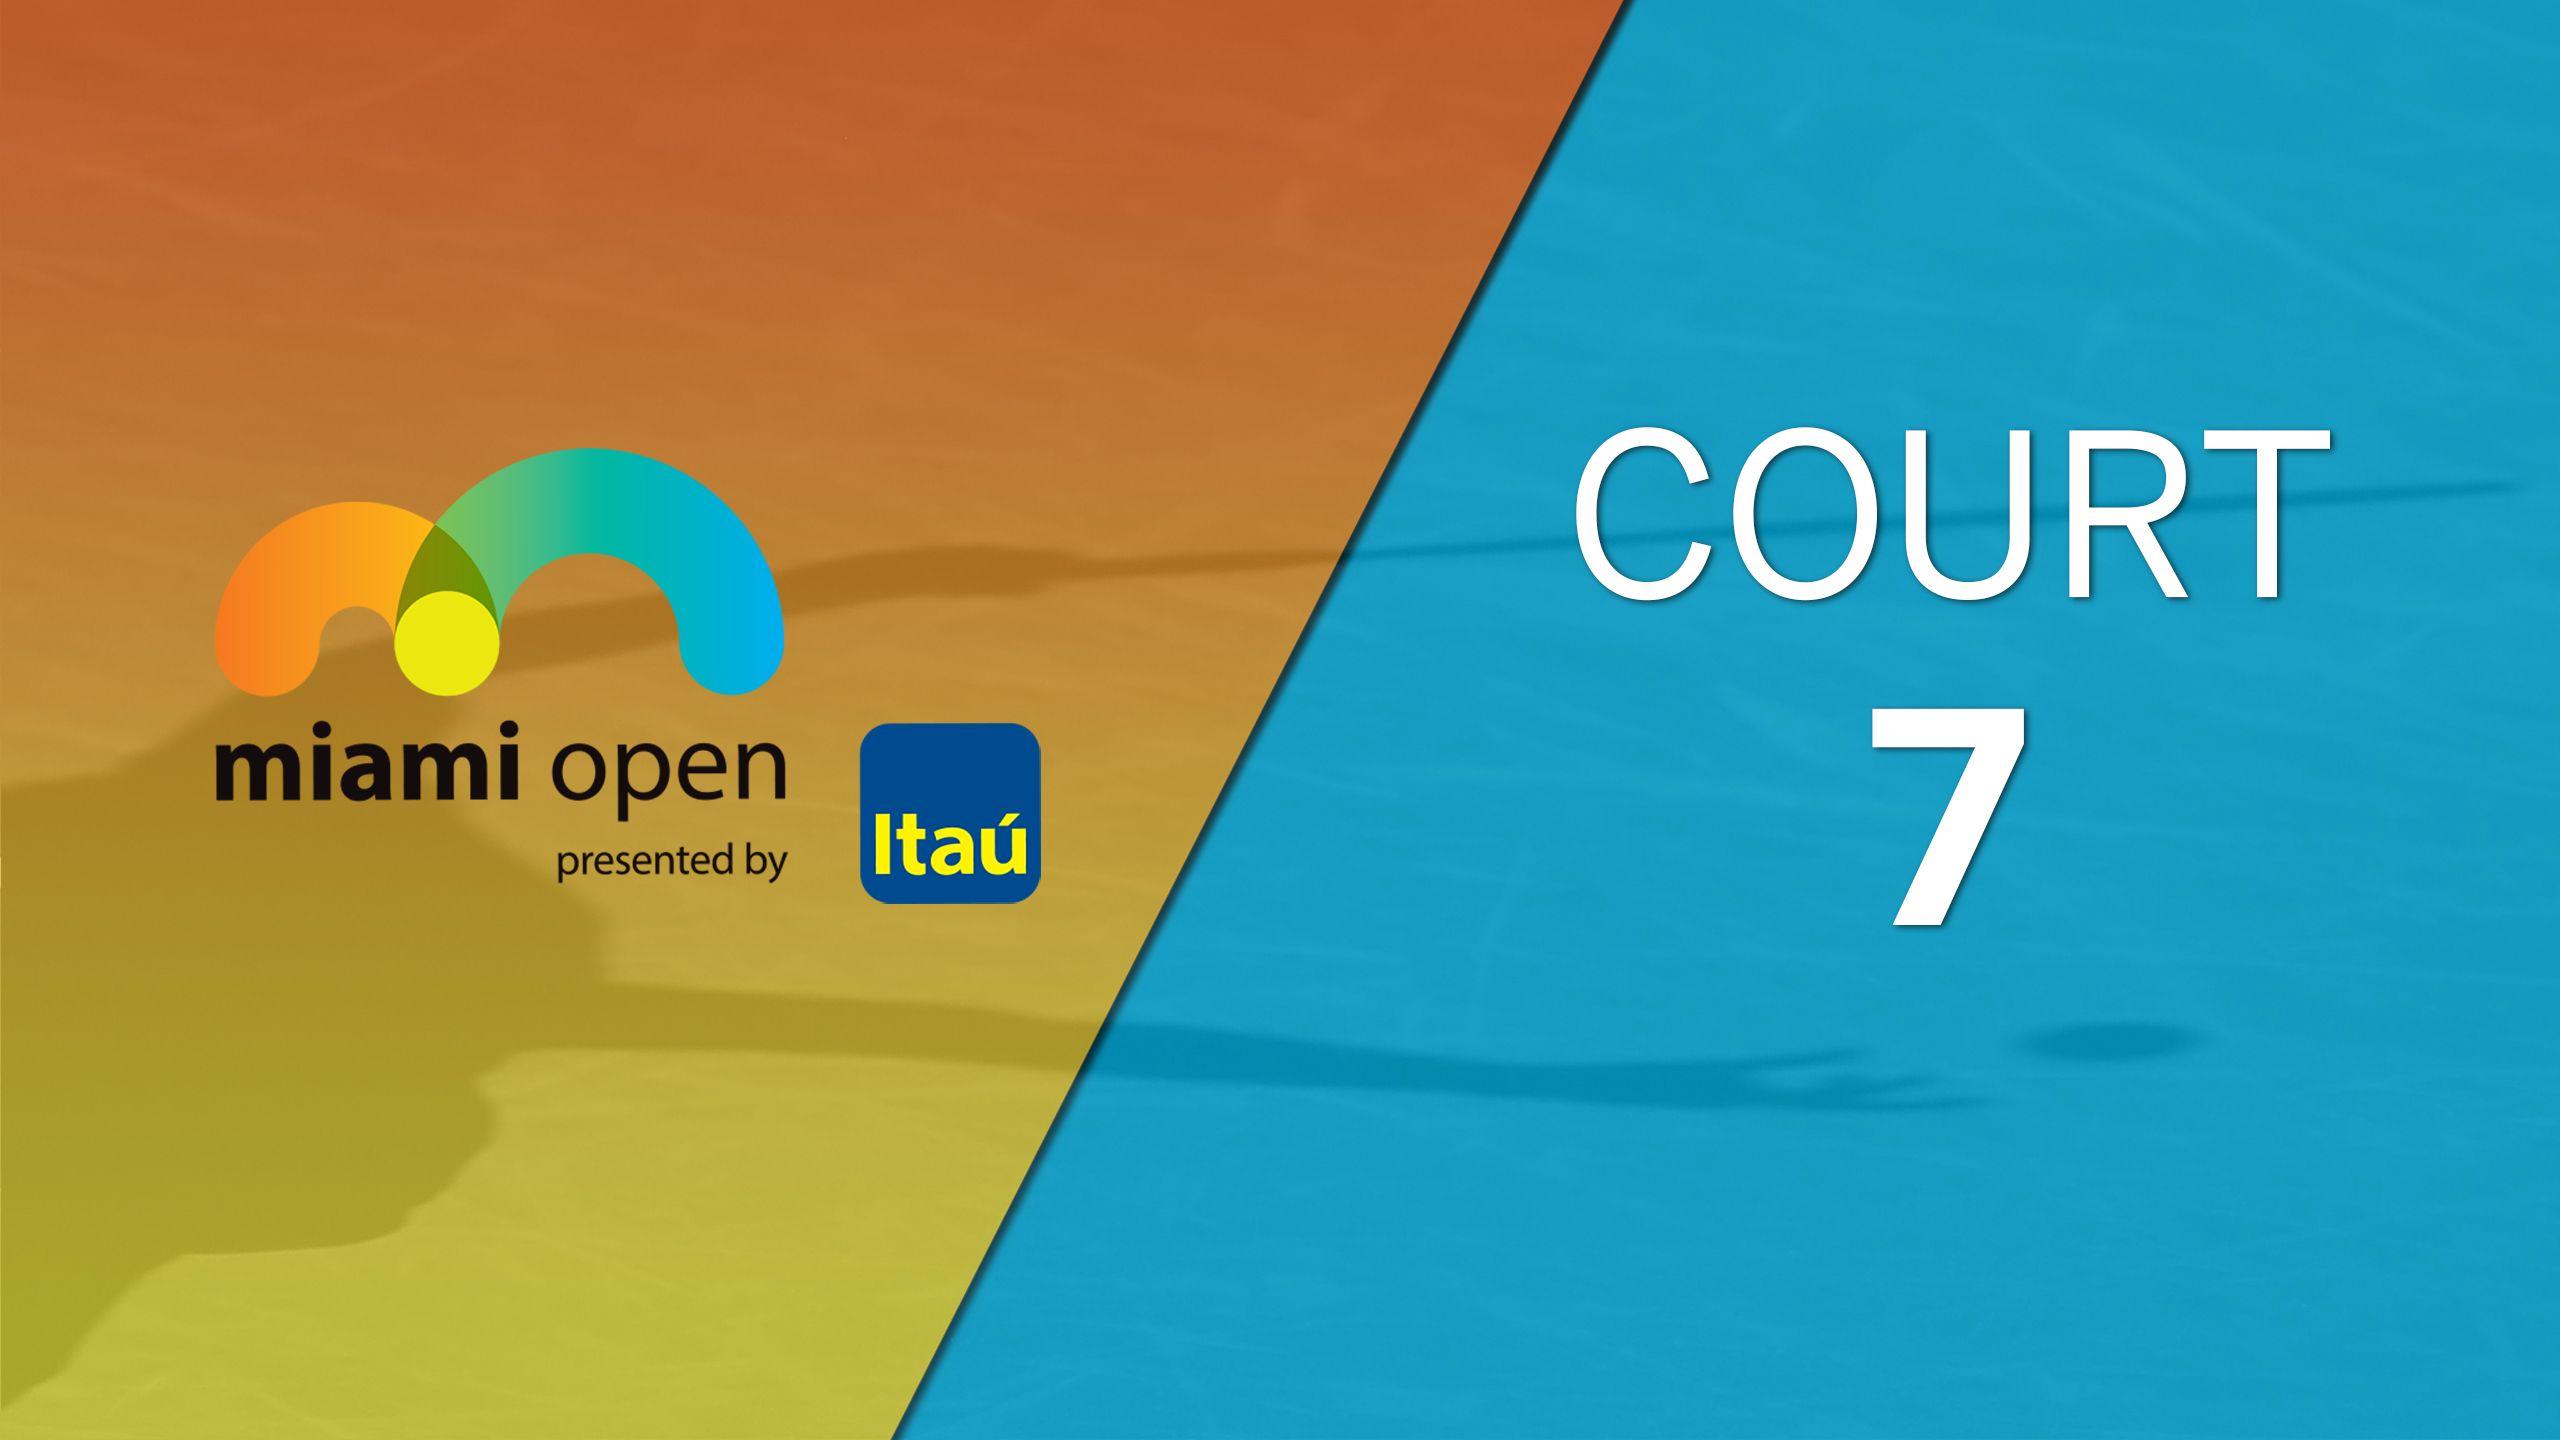 Miami Open - Court 7 (Second Round)